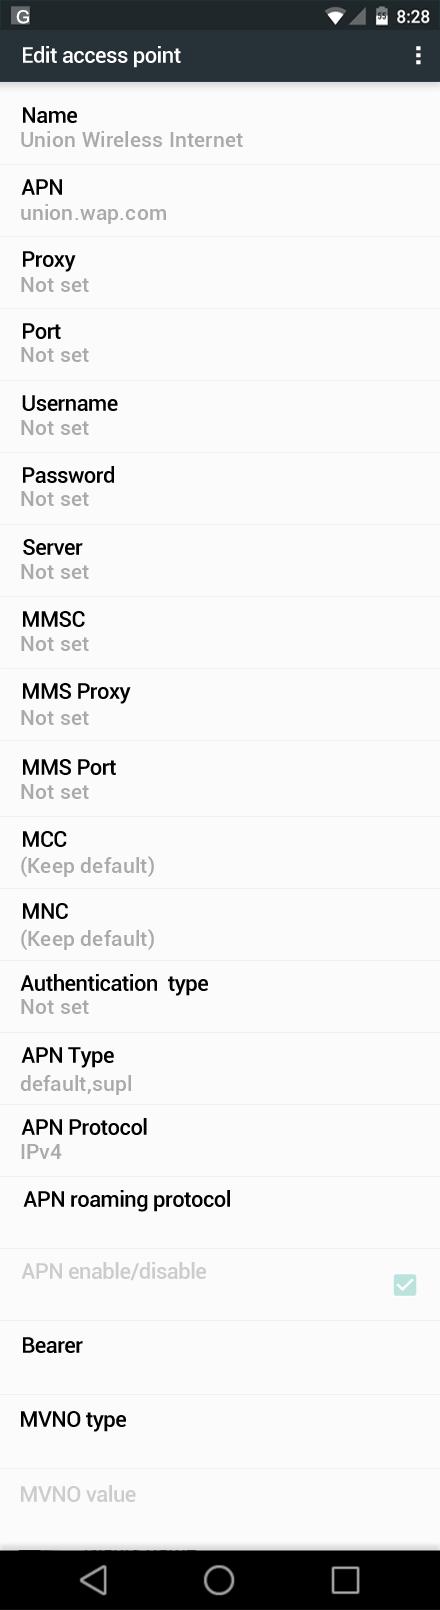 Union Wireless Internet APN settings for Android Marshmallow screenshot